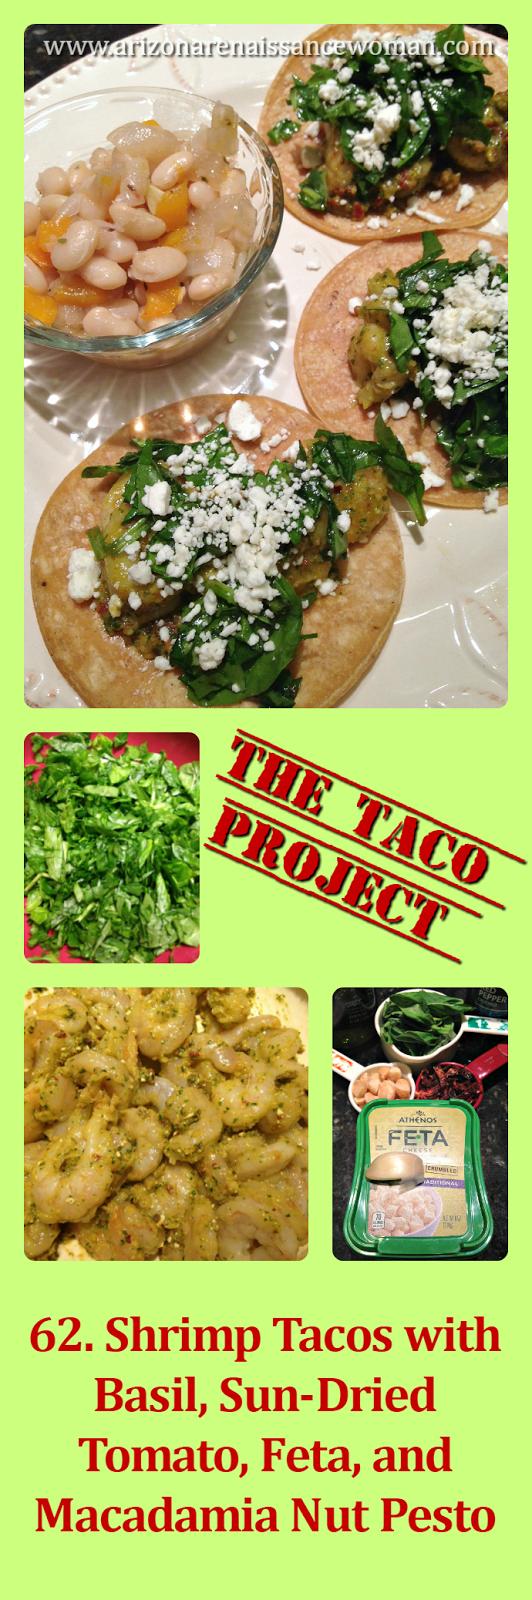 Shrimp Tacos with Basil, Sun-Dried Tomato, Feta, and Macadamia Nut Pesto Collage